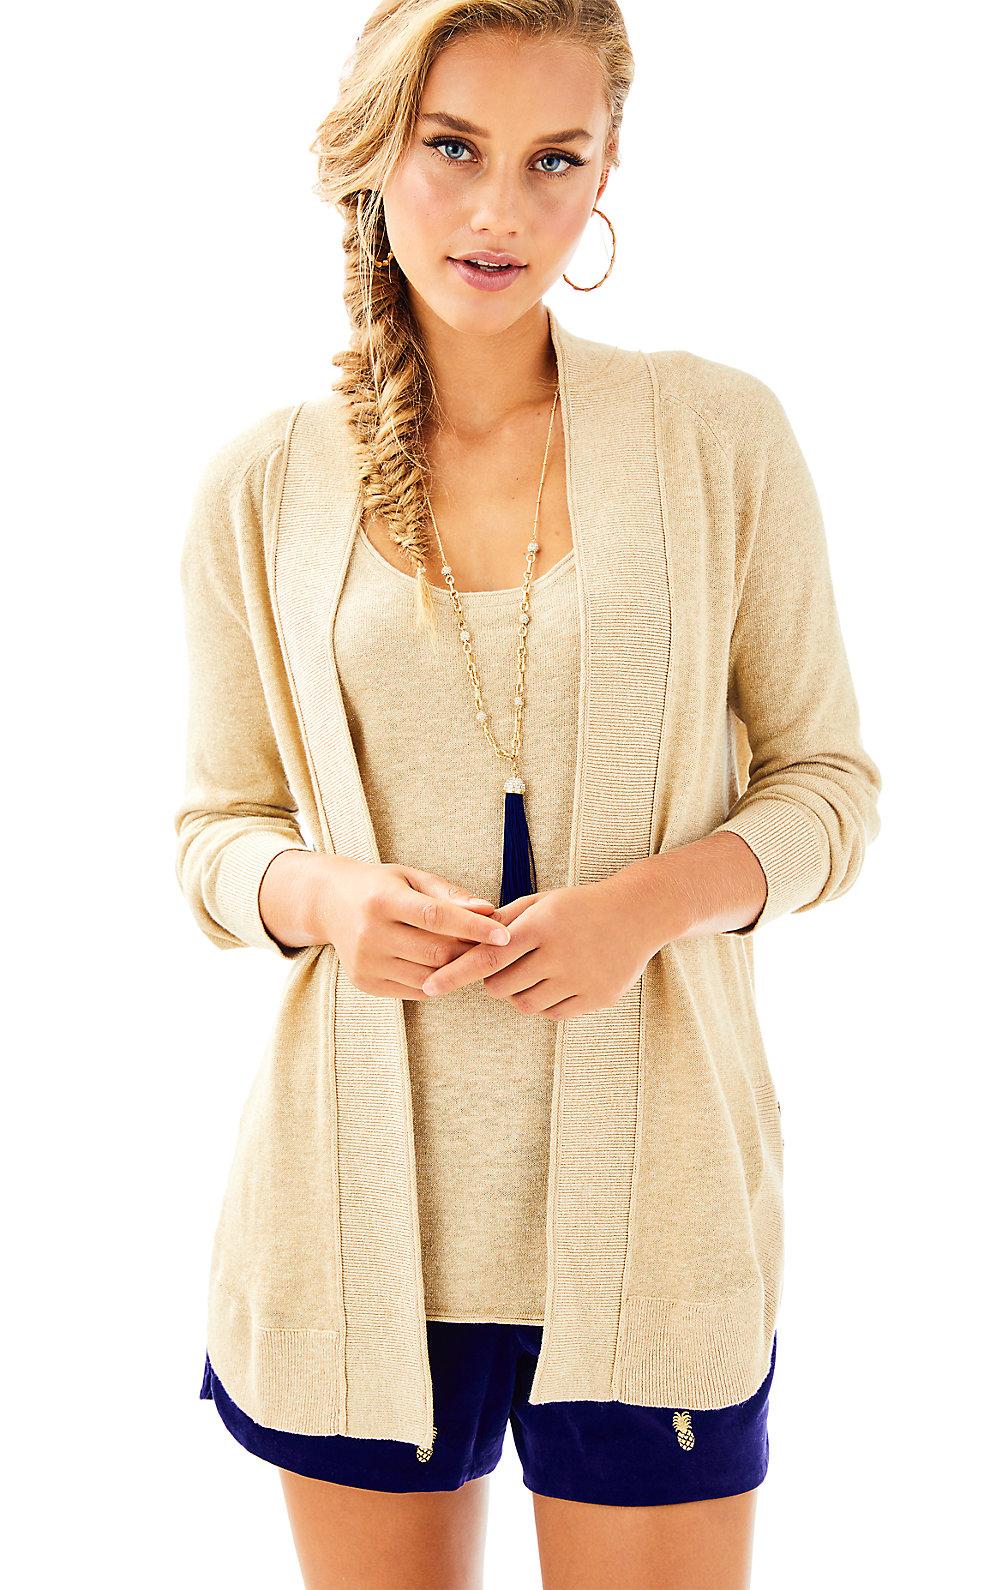 Lilly Pulitzer Micaila Lurex Sweater Cardigan